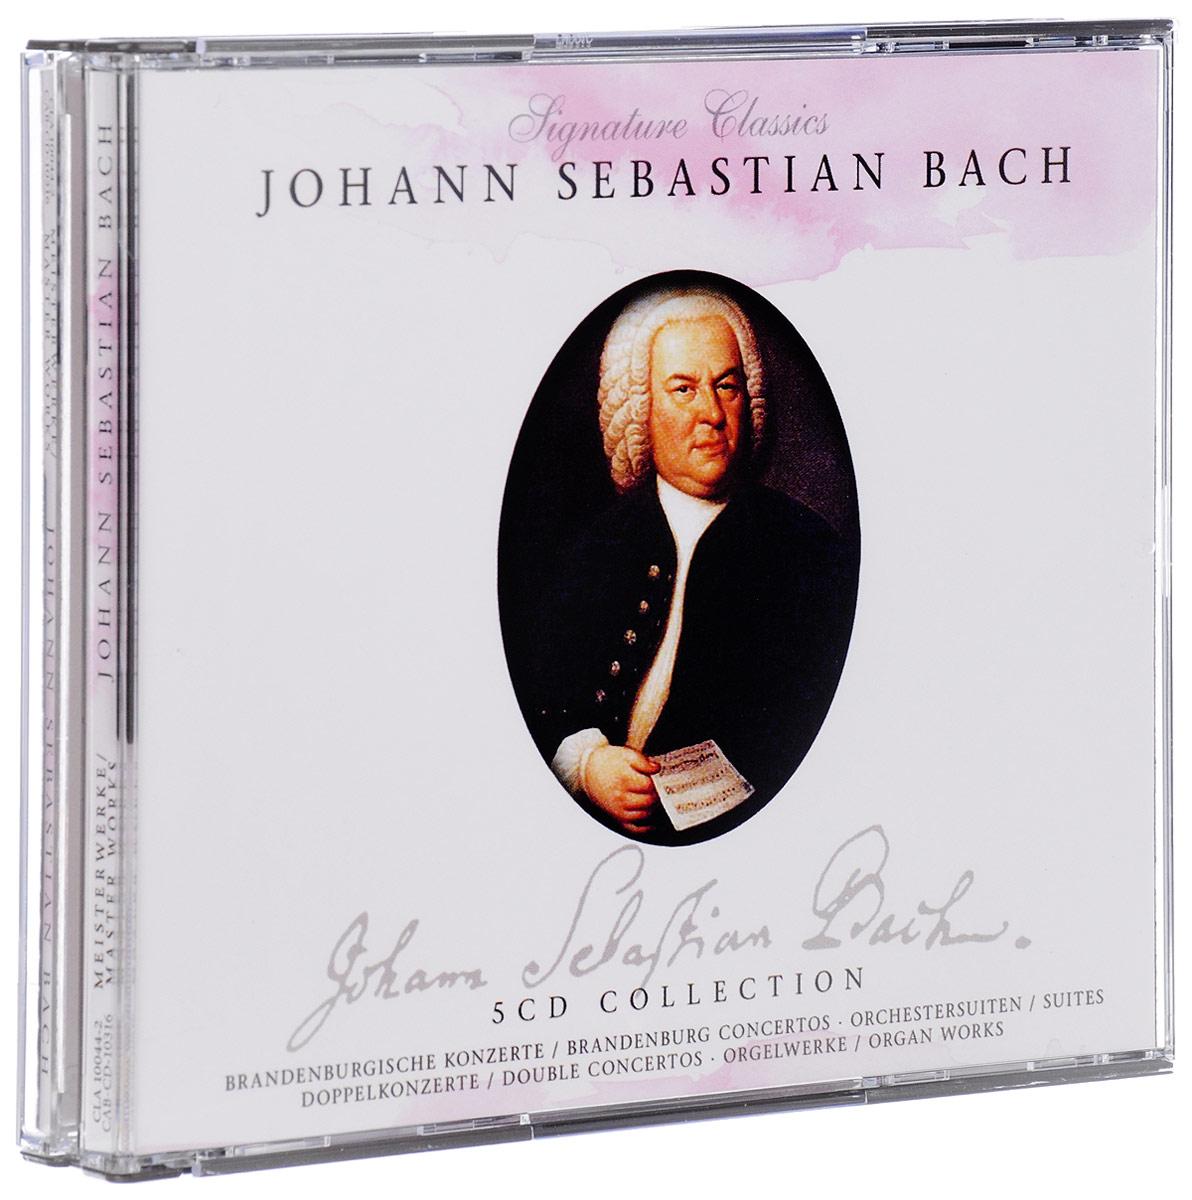 цена на Johann Sebastian Bach. Meisterwerke / Master Works (5 CD)